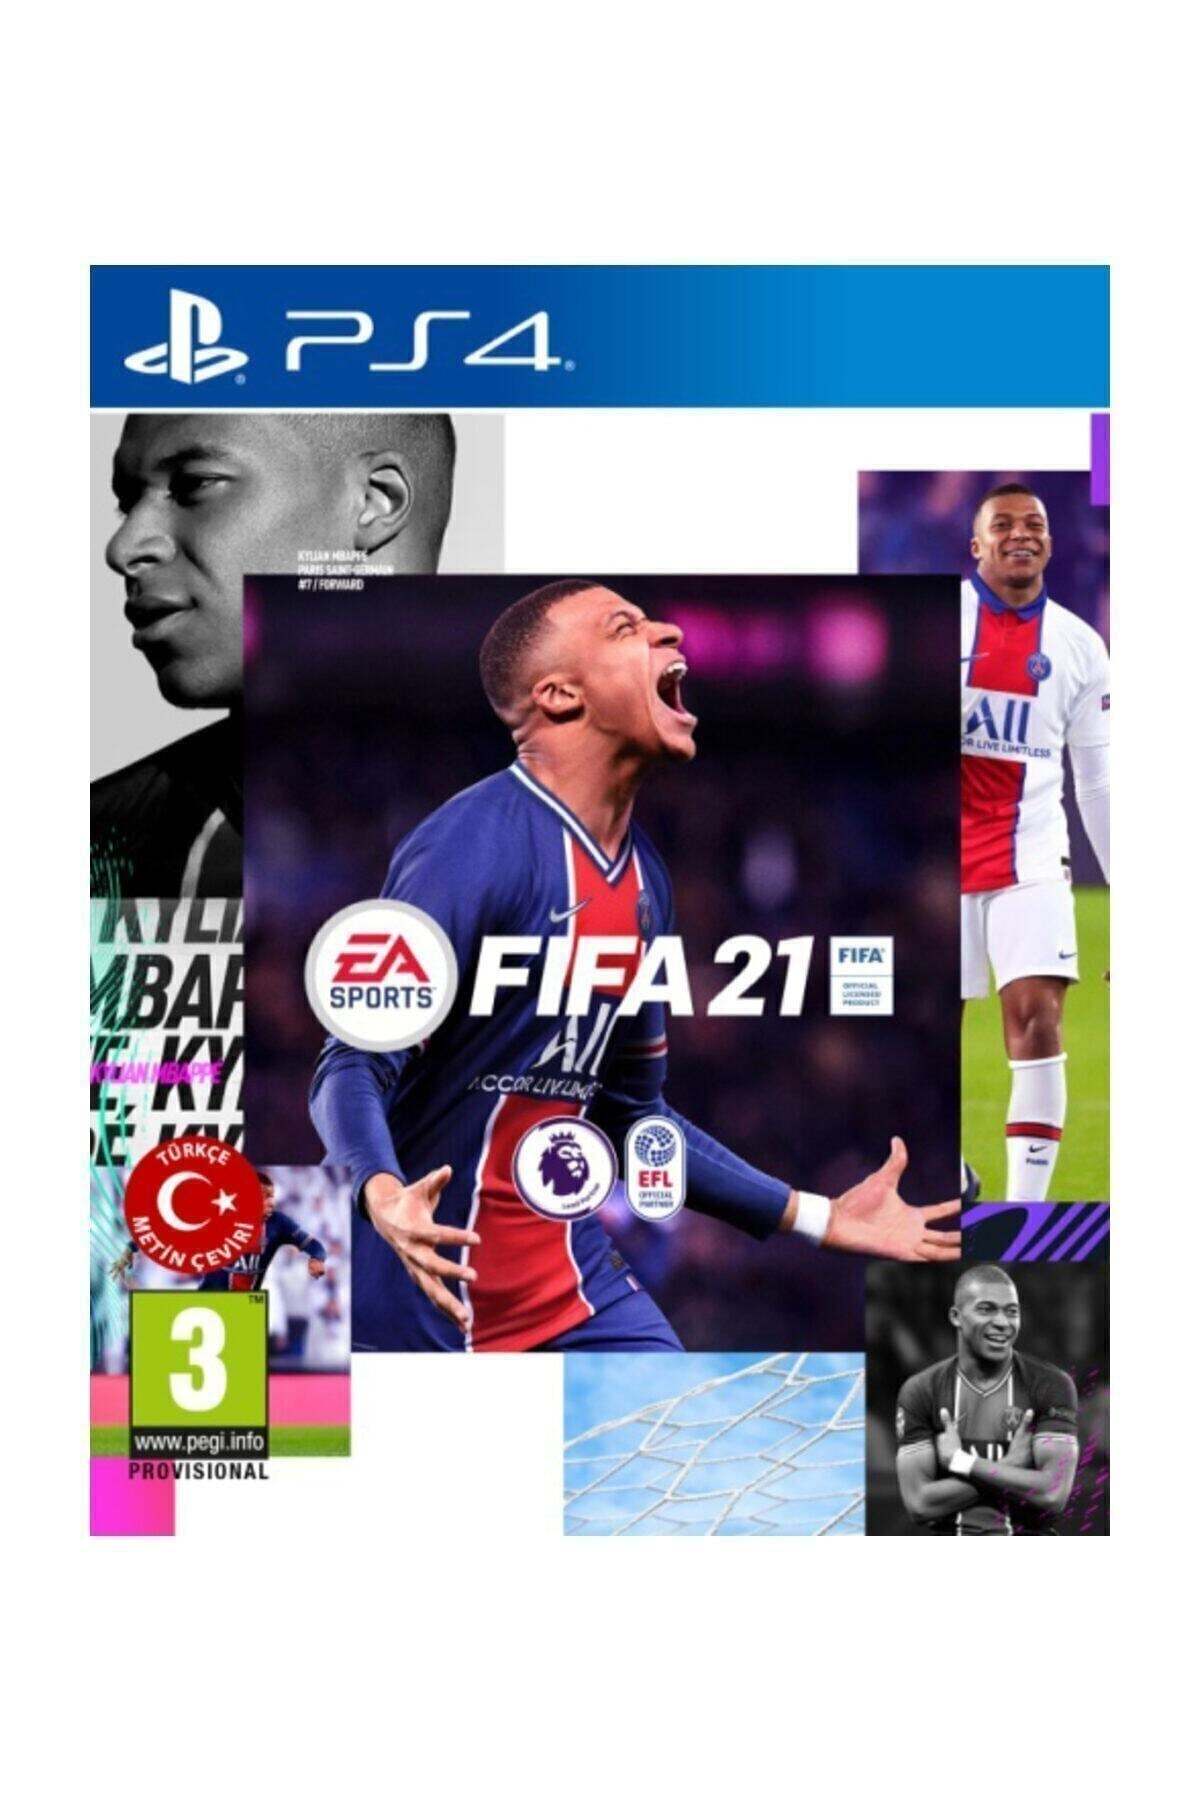 Electronic Arts Fifa 2021 PS4 Oyun - Türkçe Menü 1